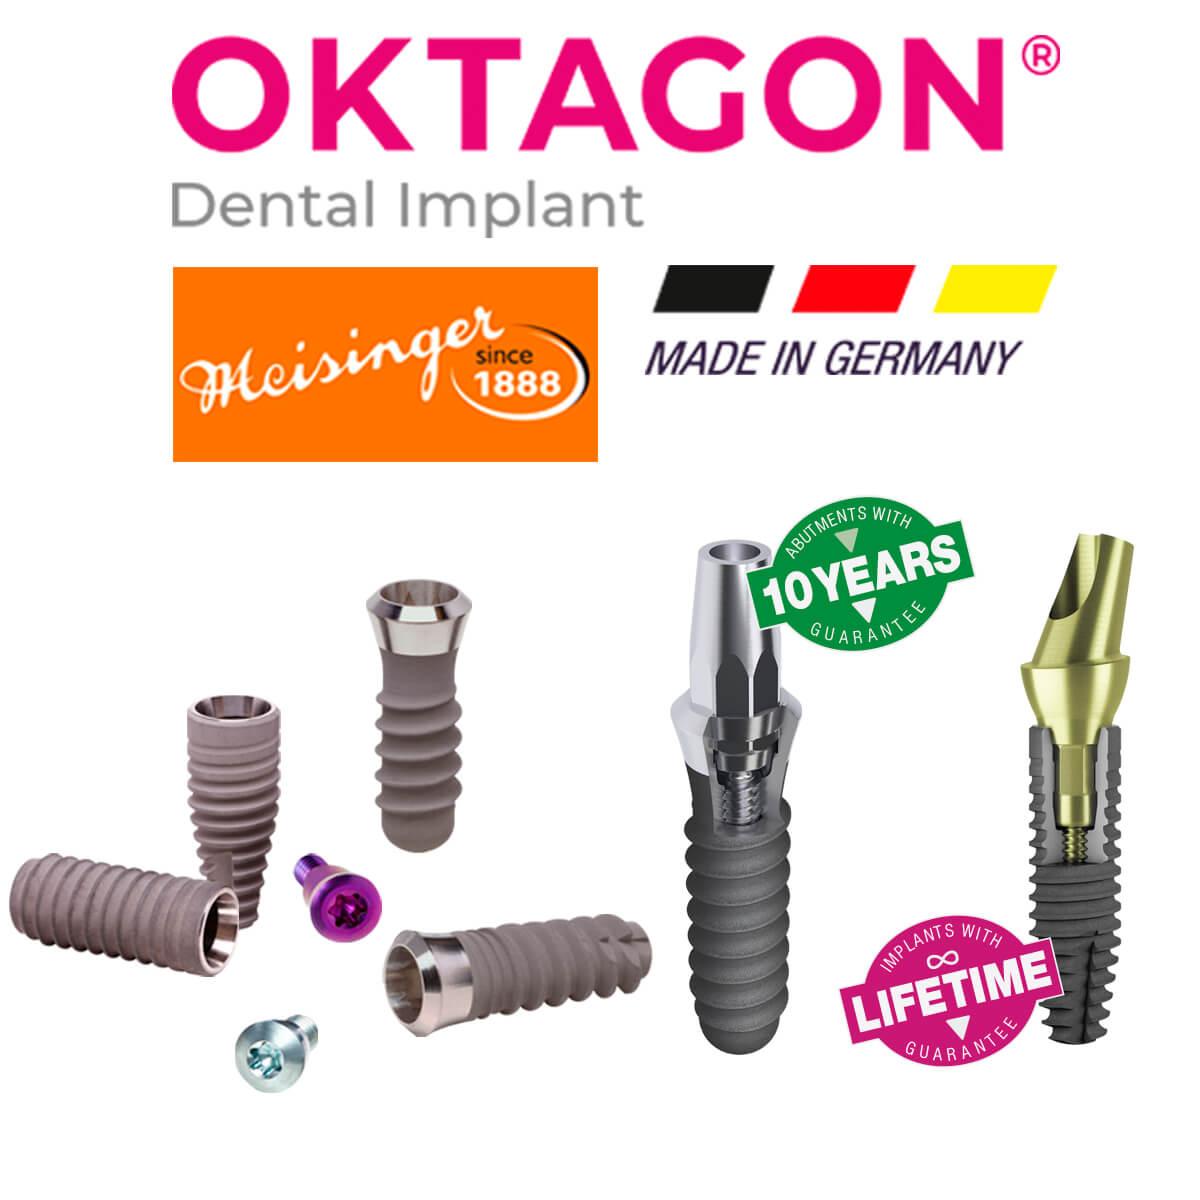 Oktagon dental implant